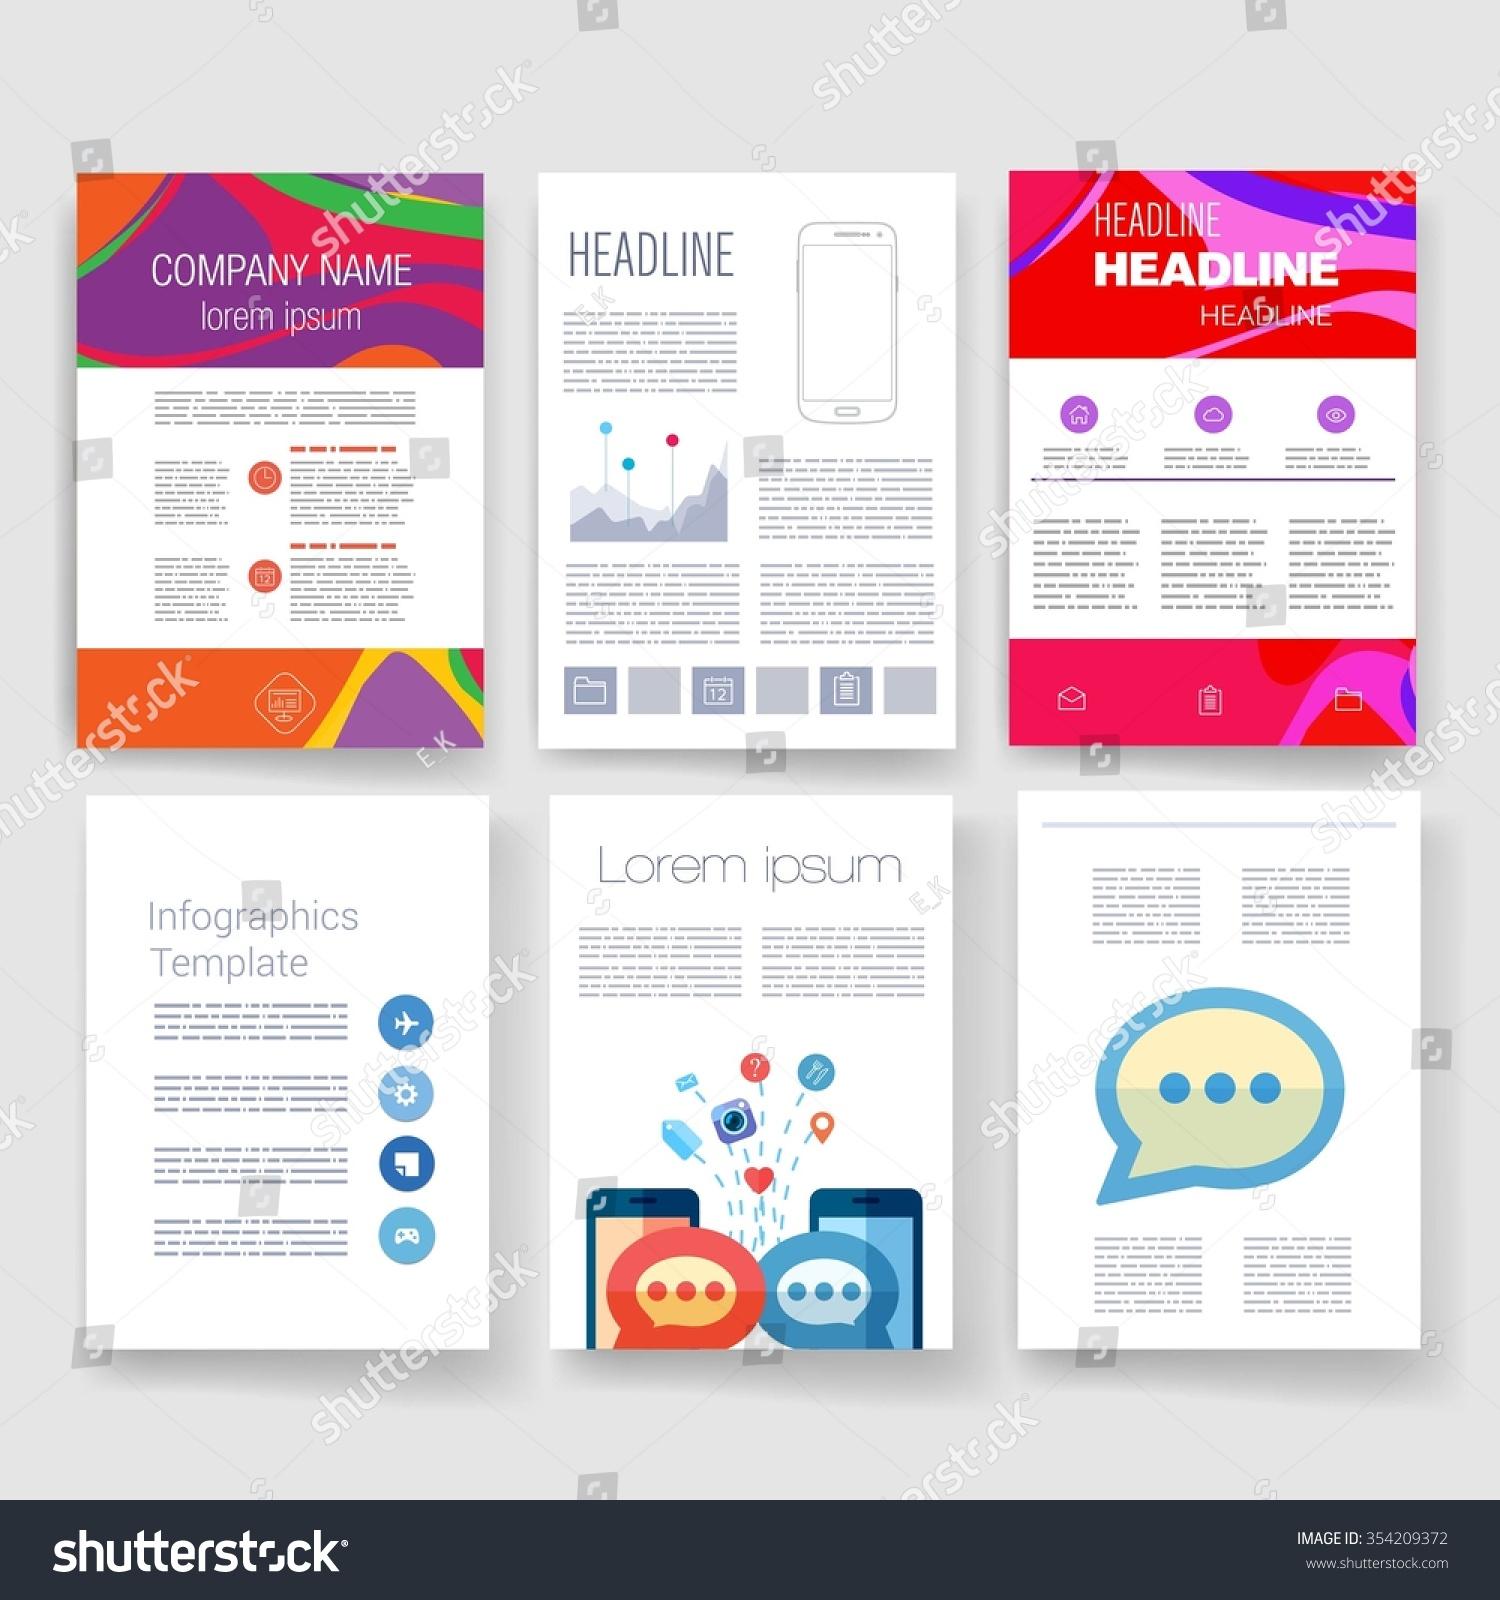 mail designer pro templates - brochure design template set templates design stock vector